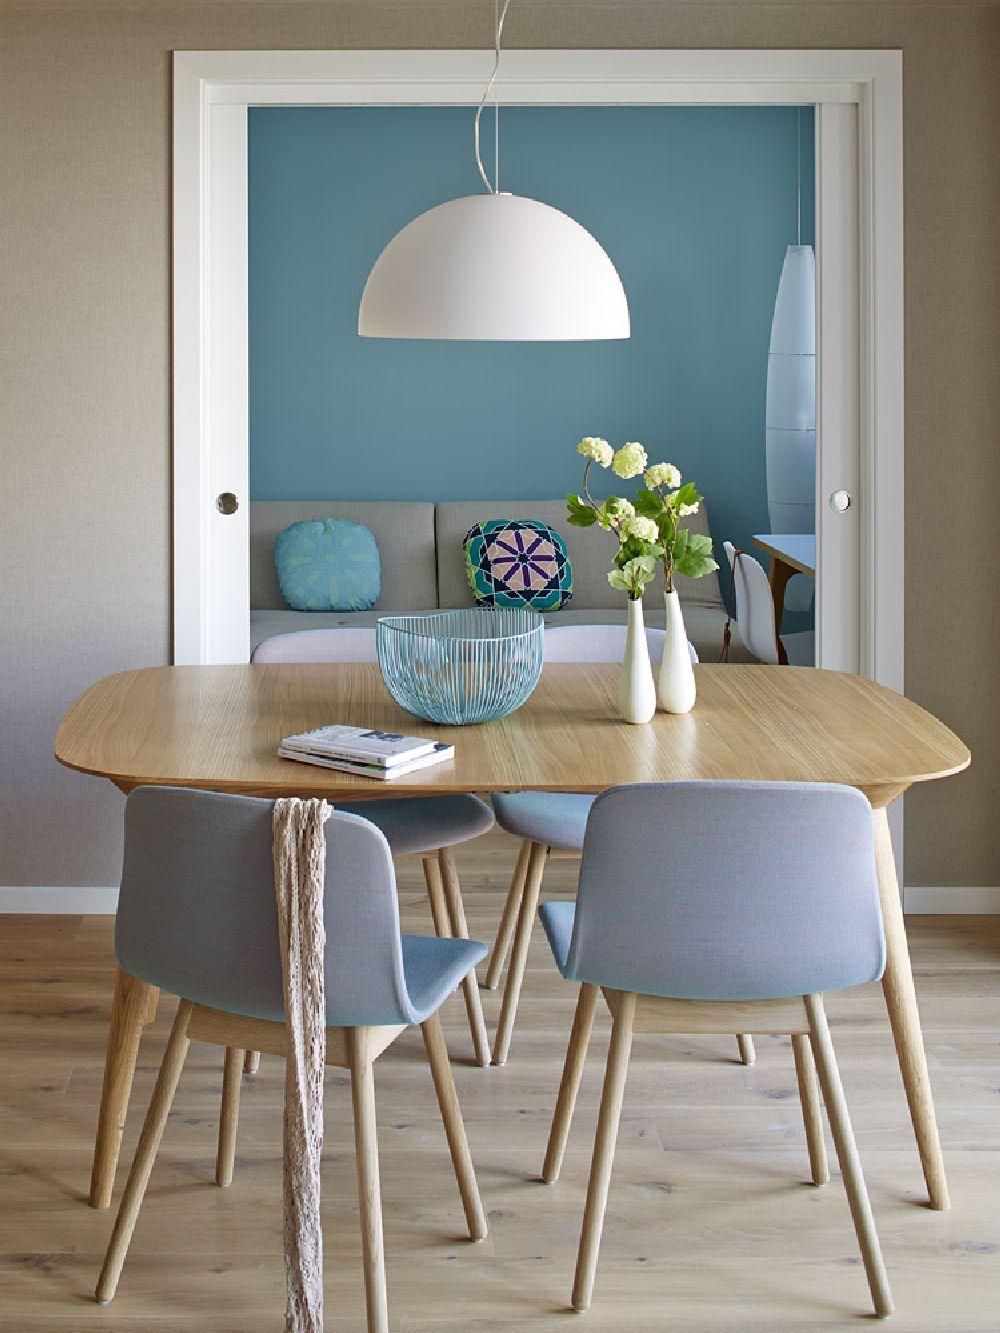 adelaparvu.com despre apartament cu aer mediteranean, design interior Meritxell Ribe (5)